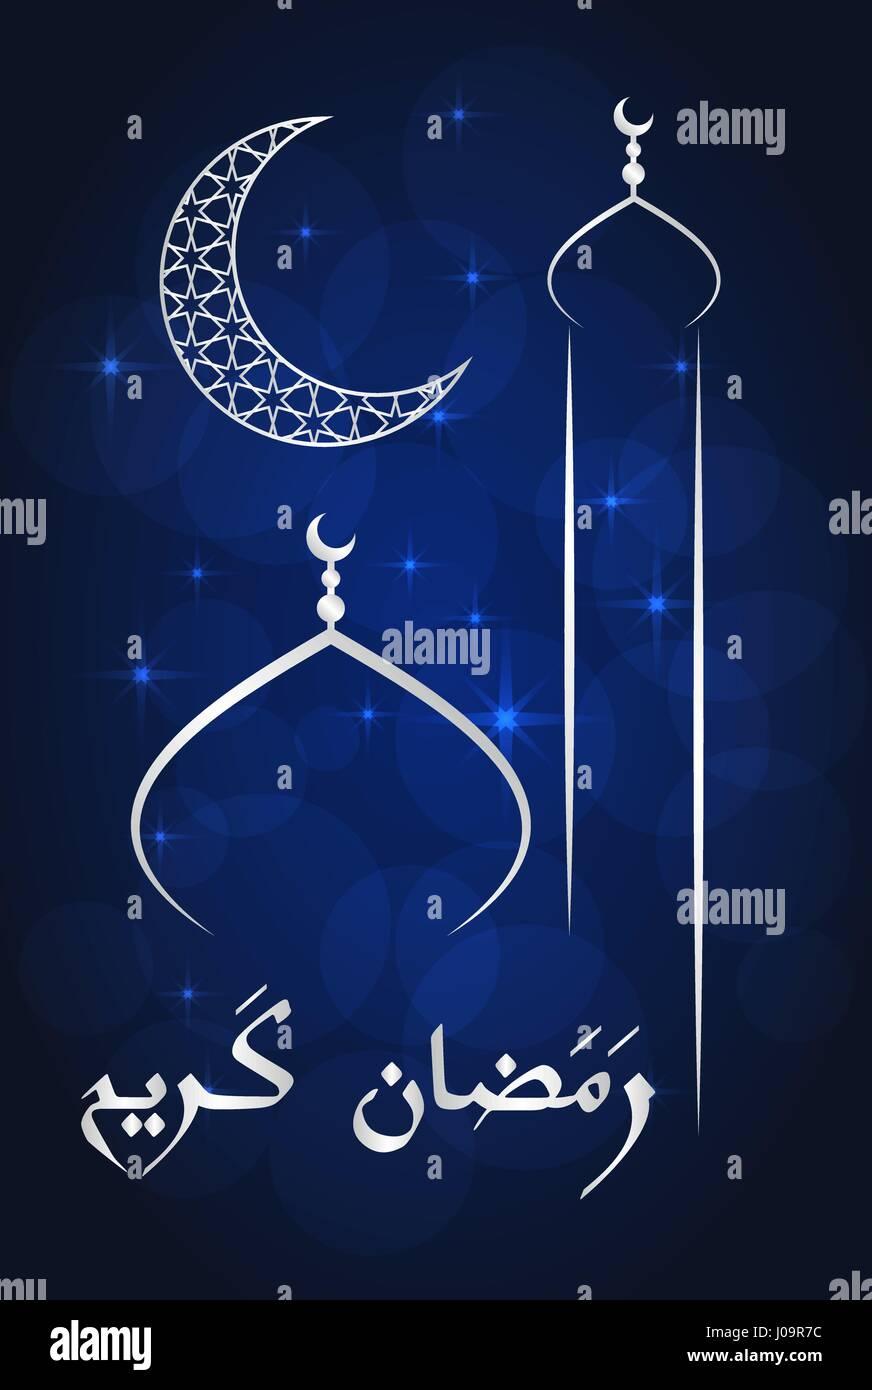 Ramadan greeting card on blue background vector illustration stock ramadan greeting card on blue background vector illustration ramadan kareem means ramadan is generous m4hsunfo Image collections